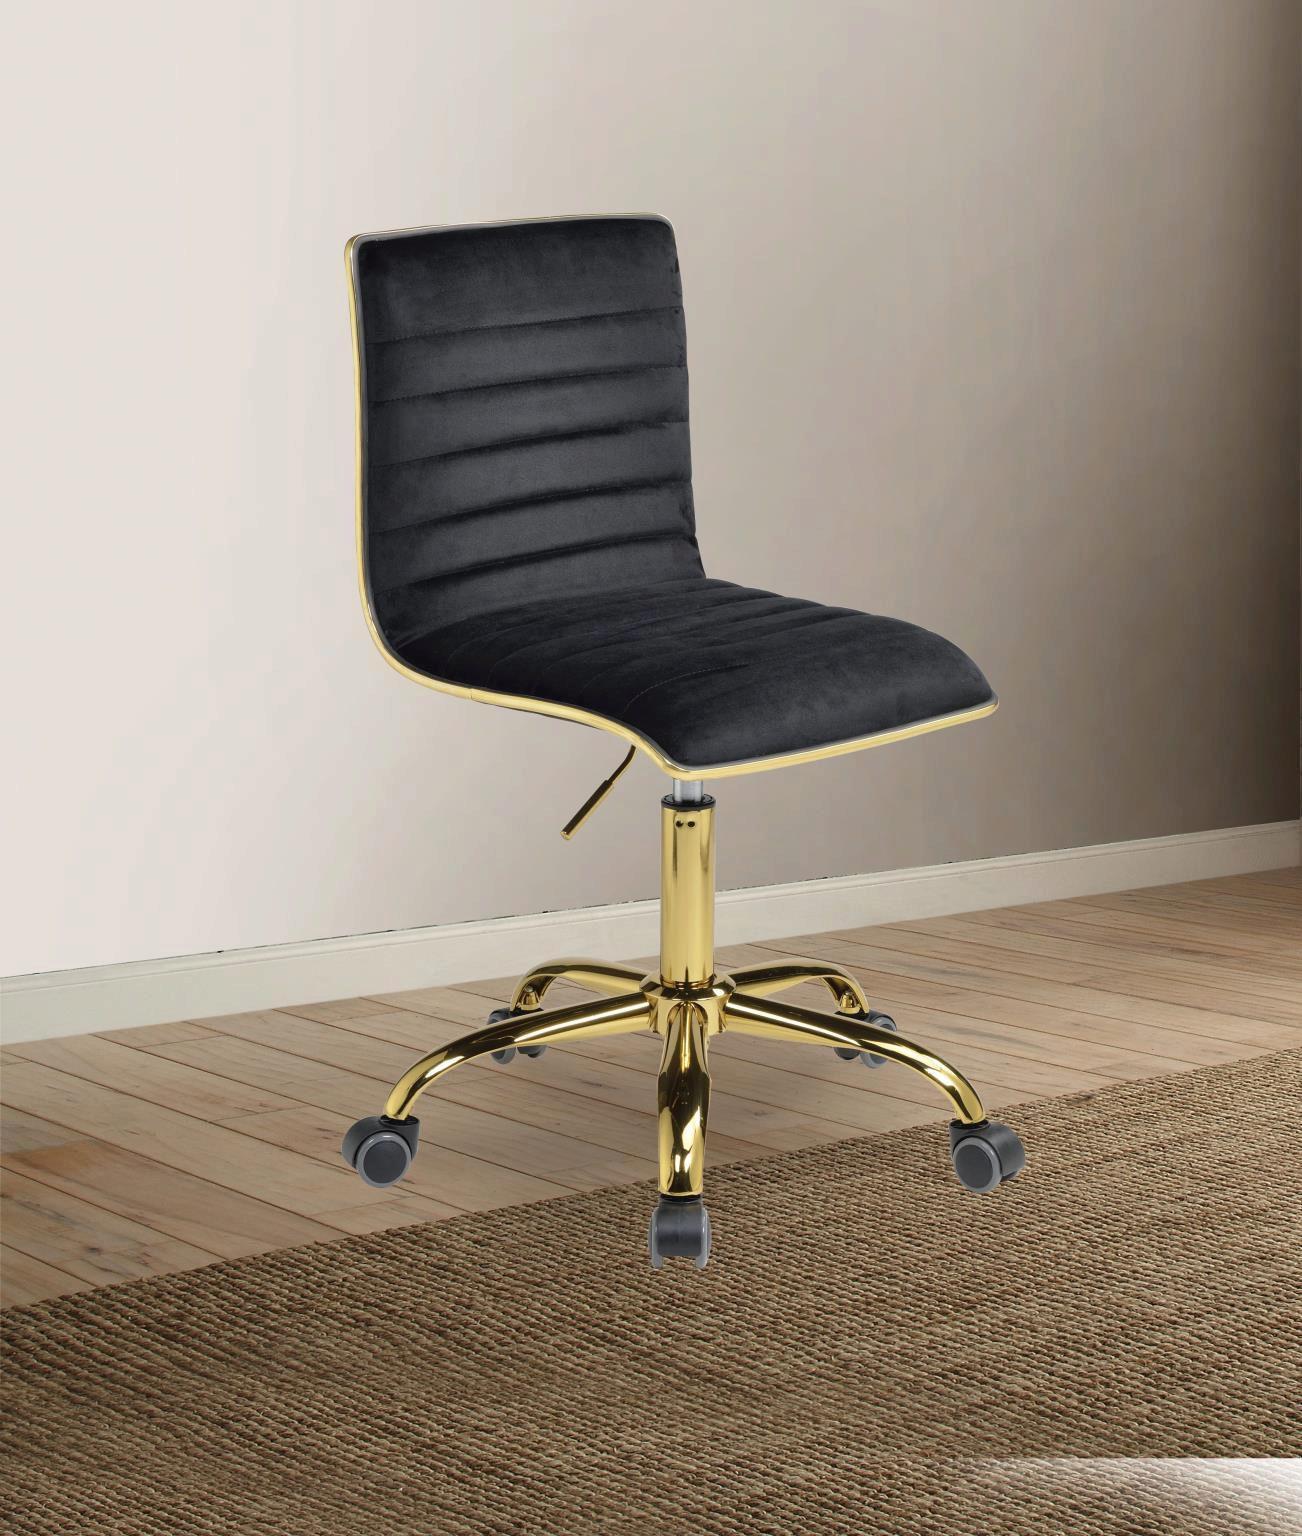 Home Office Chair Vintage Gray Pu Black Pakuna 92942 Acme Contemporary Modern Pakuna 92942 Buy Online